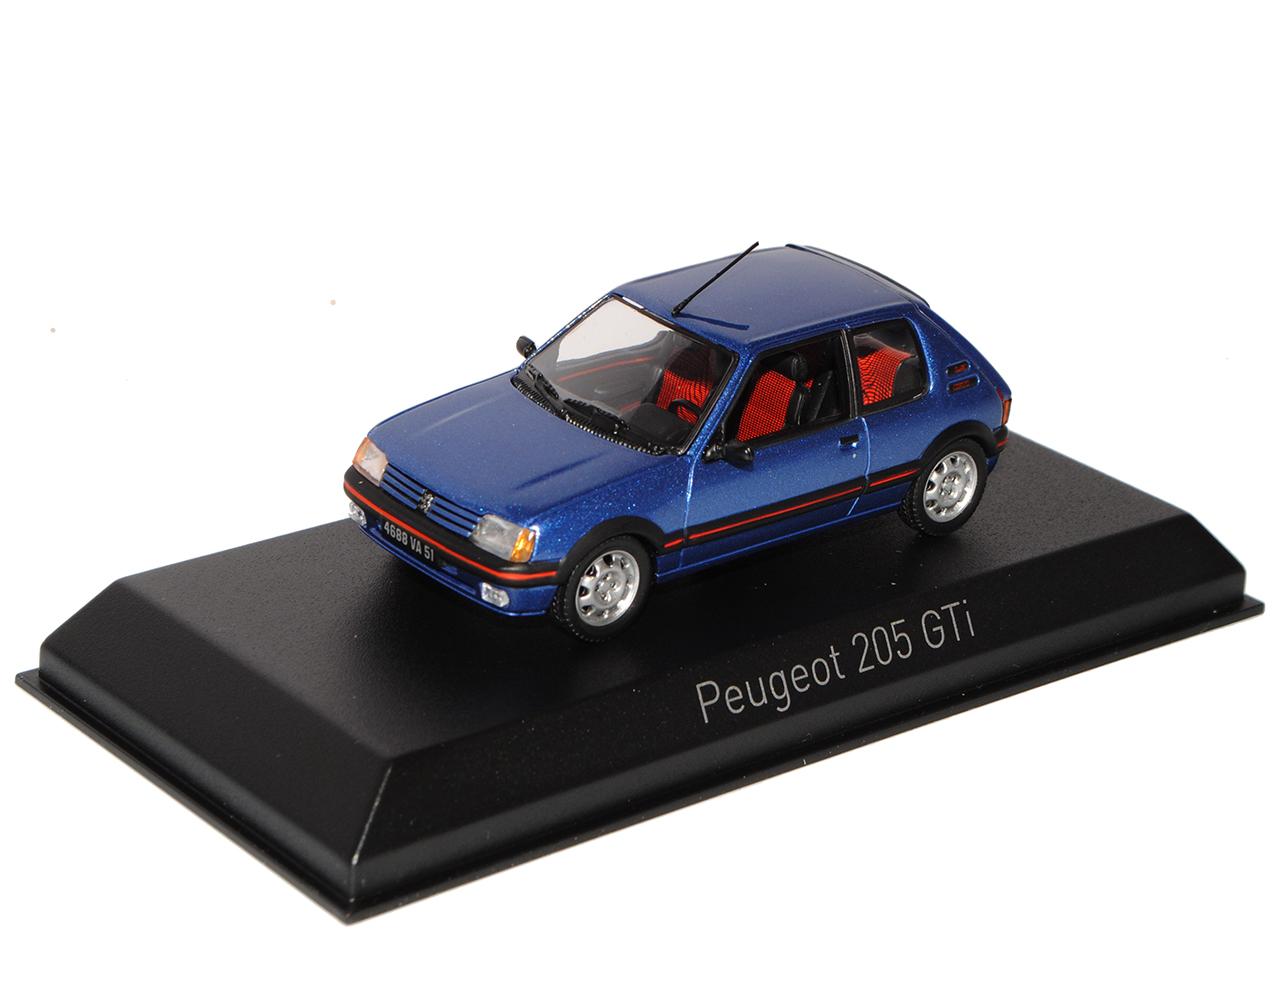 Norev Peugeot 205 GTI 1.6 Silber Grau 1983-1998 1//18 Modell Auto